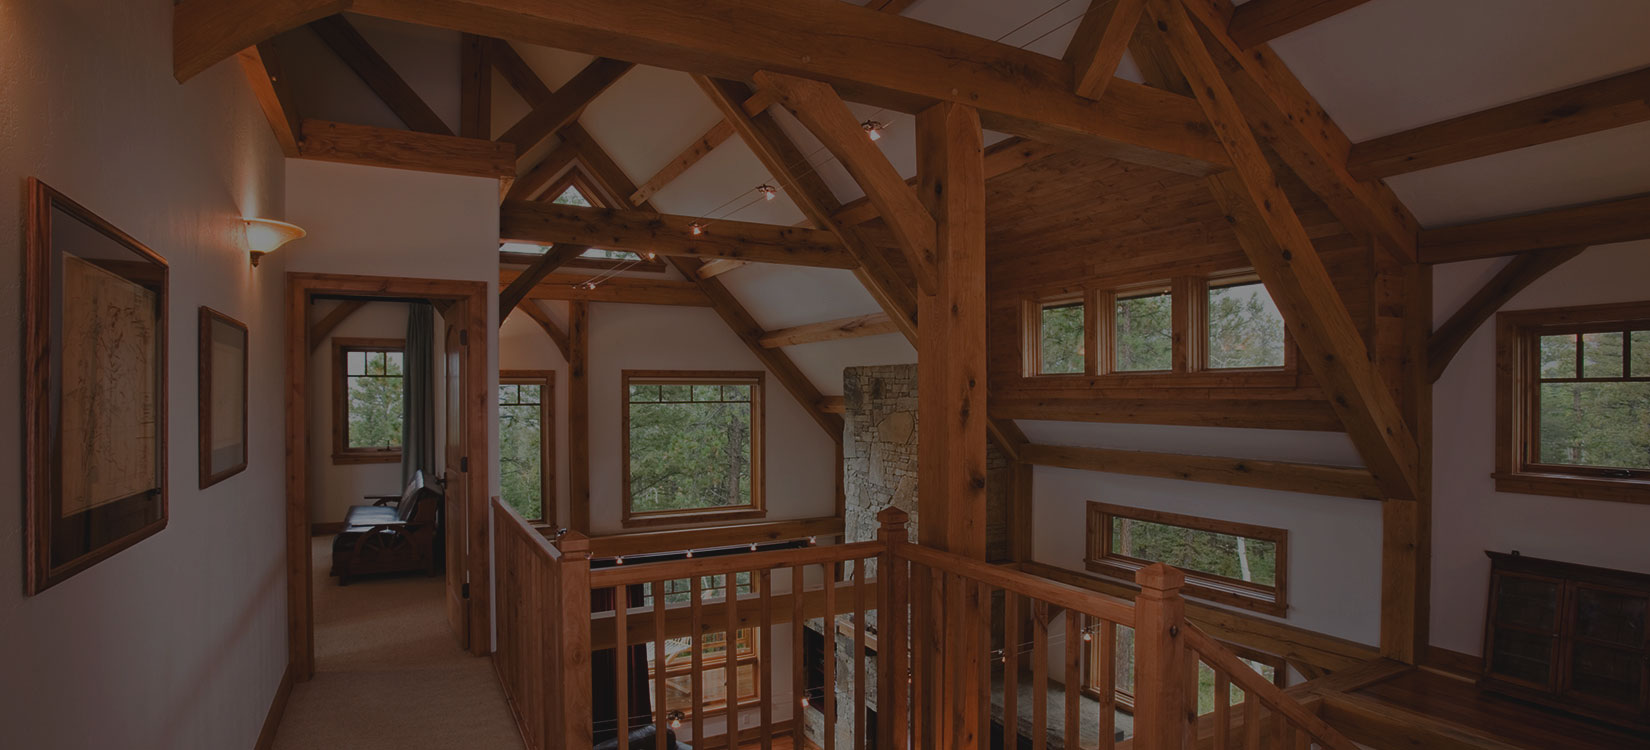 Wind river timberframes mancos colorado custom timber for Wind river custom homes